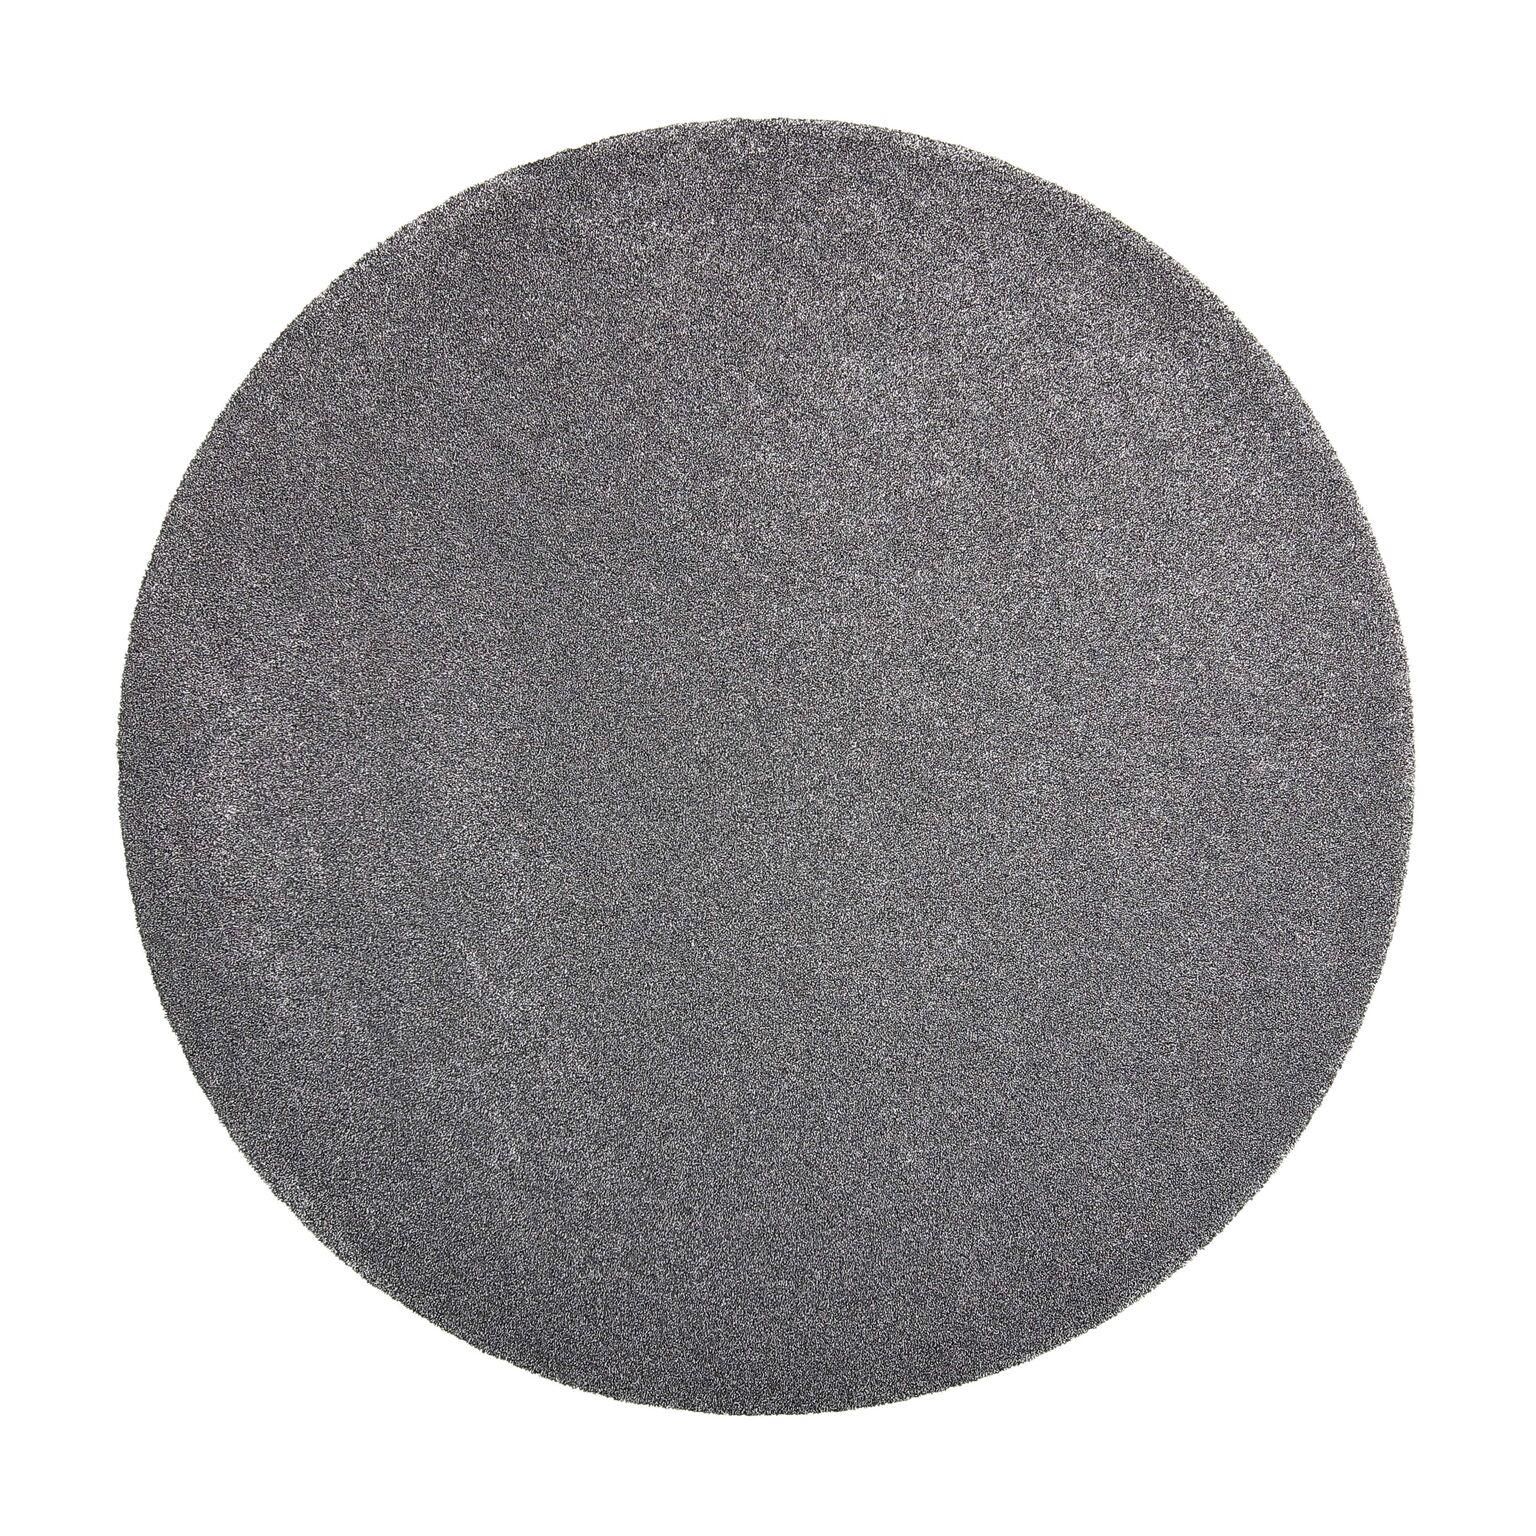 VM Carpet pyöreä Kide matto 76 antrasiitti